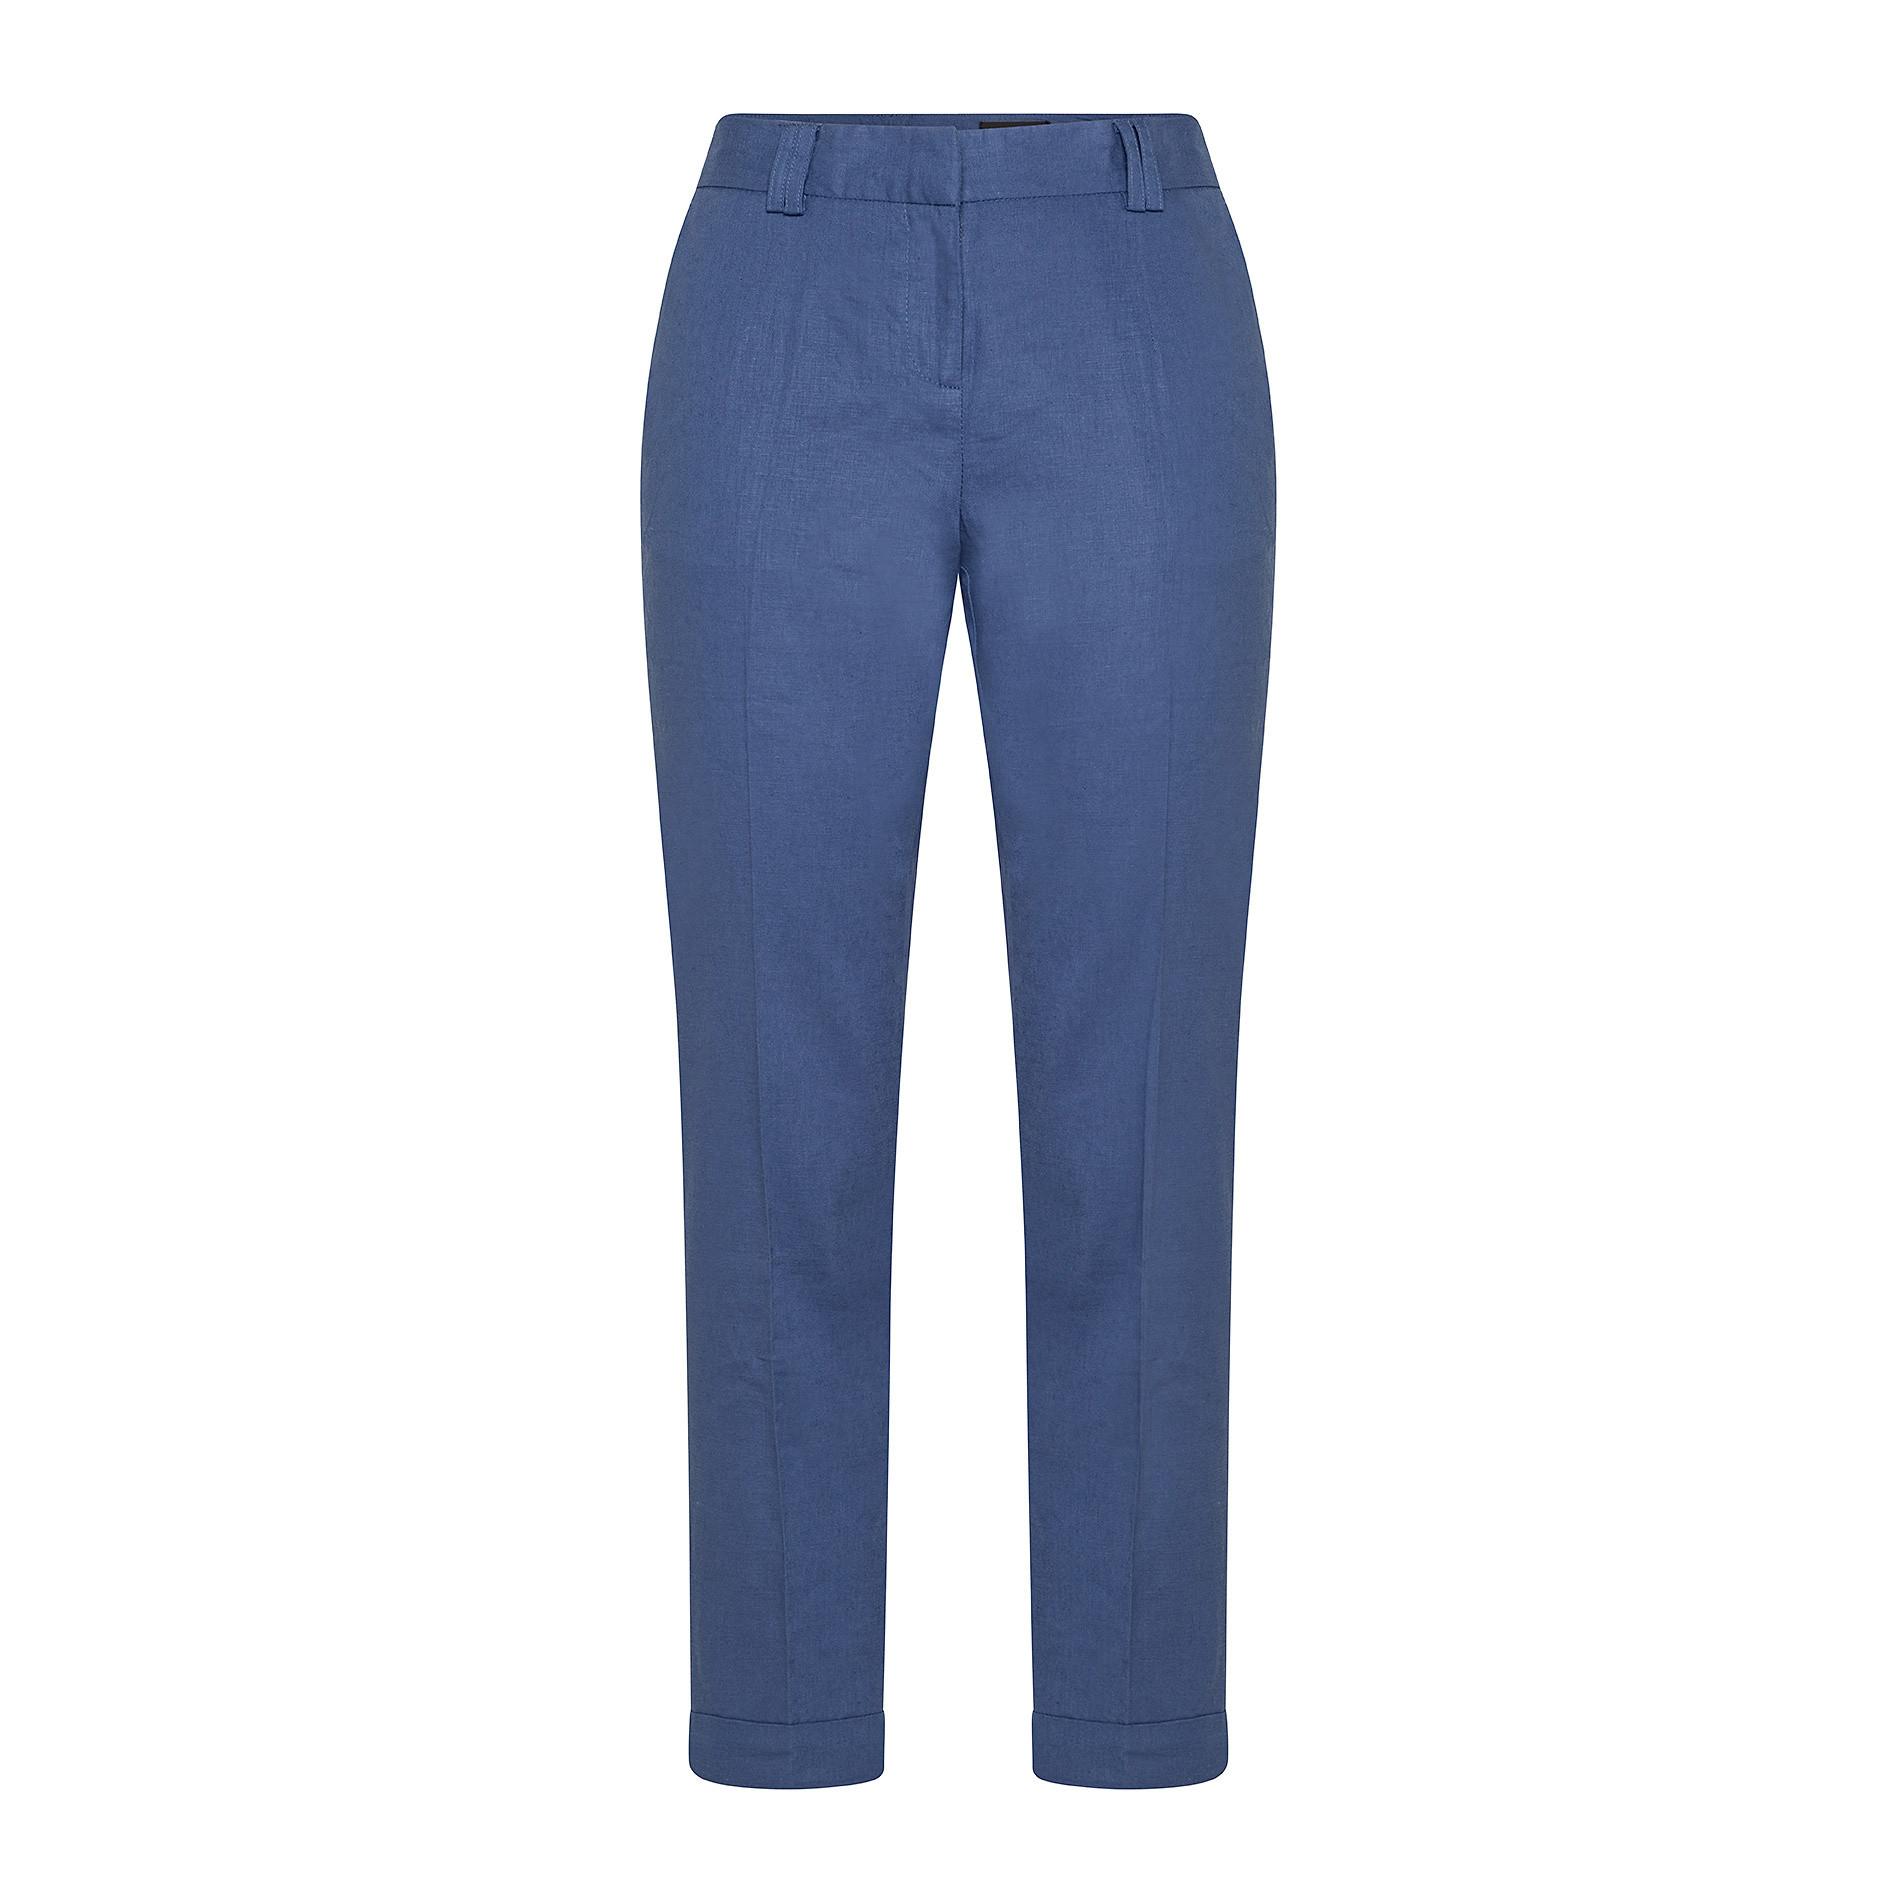 Pantalone classico in misto lino Koan, Blu scuro, large image number 0